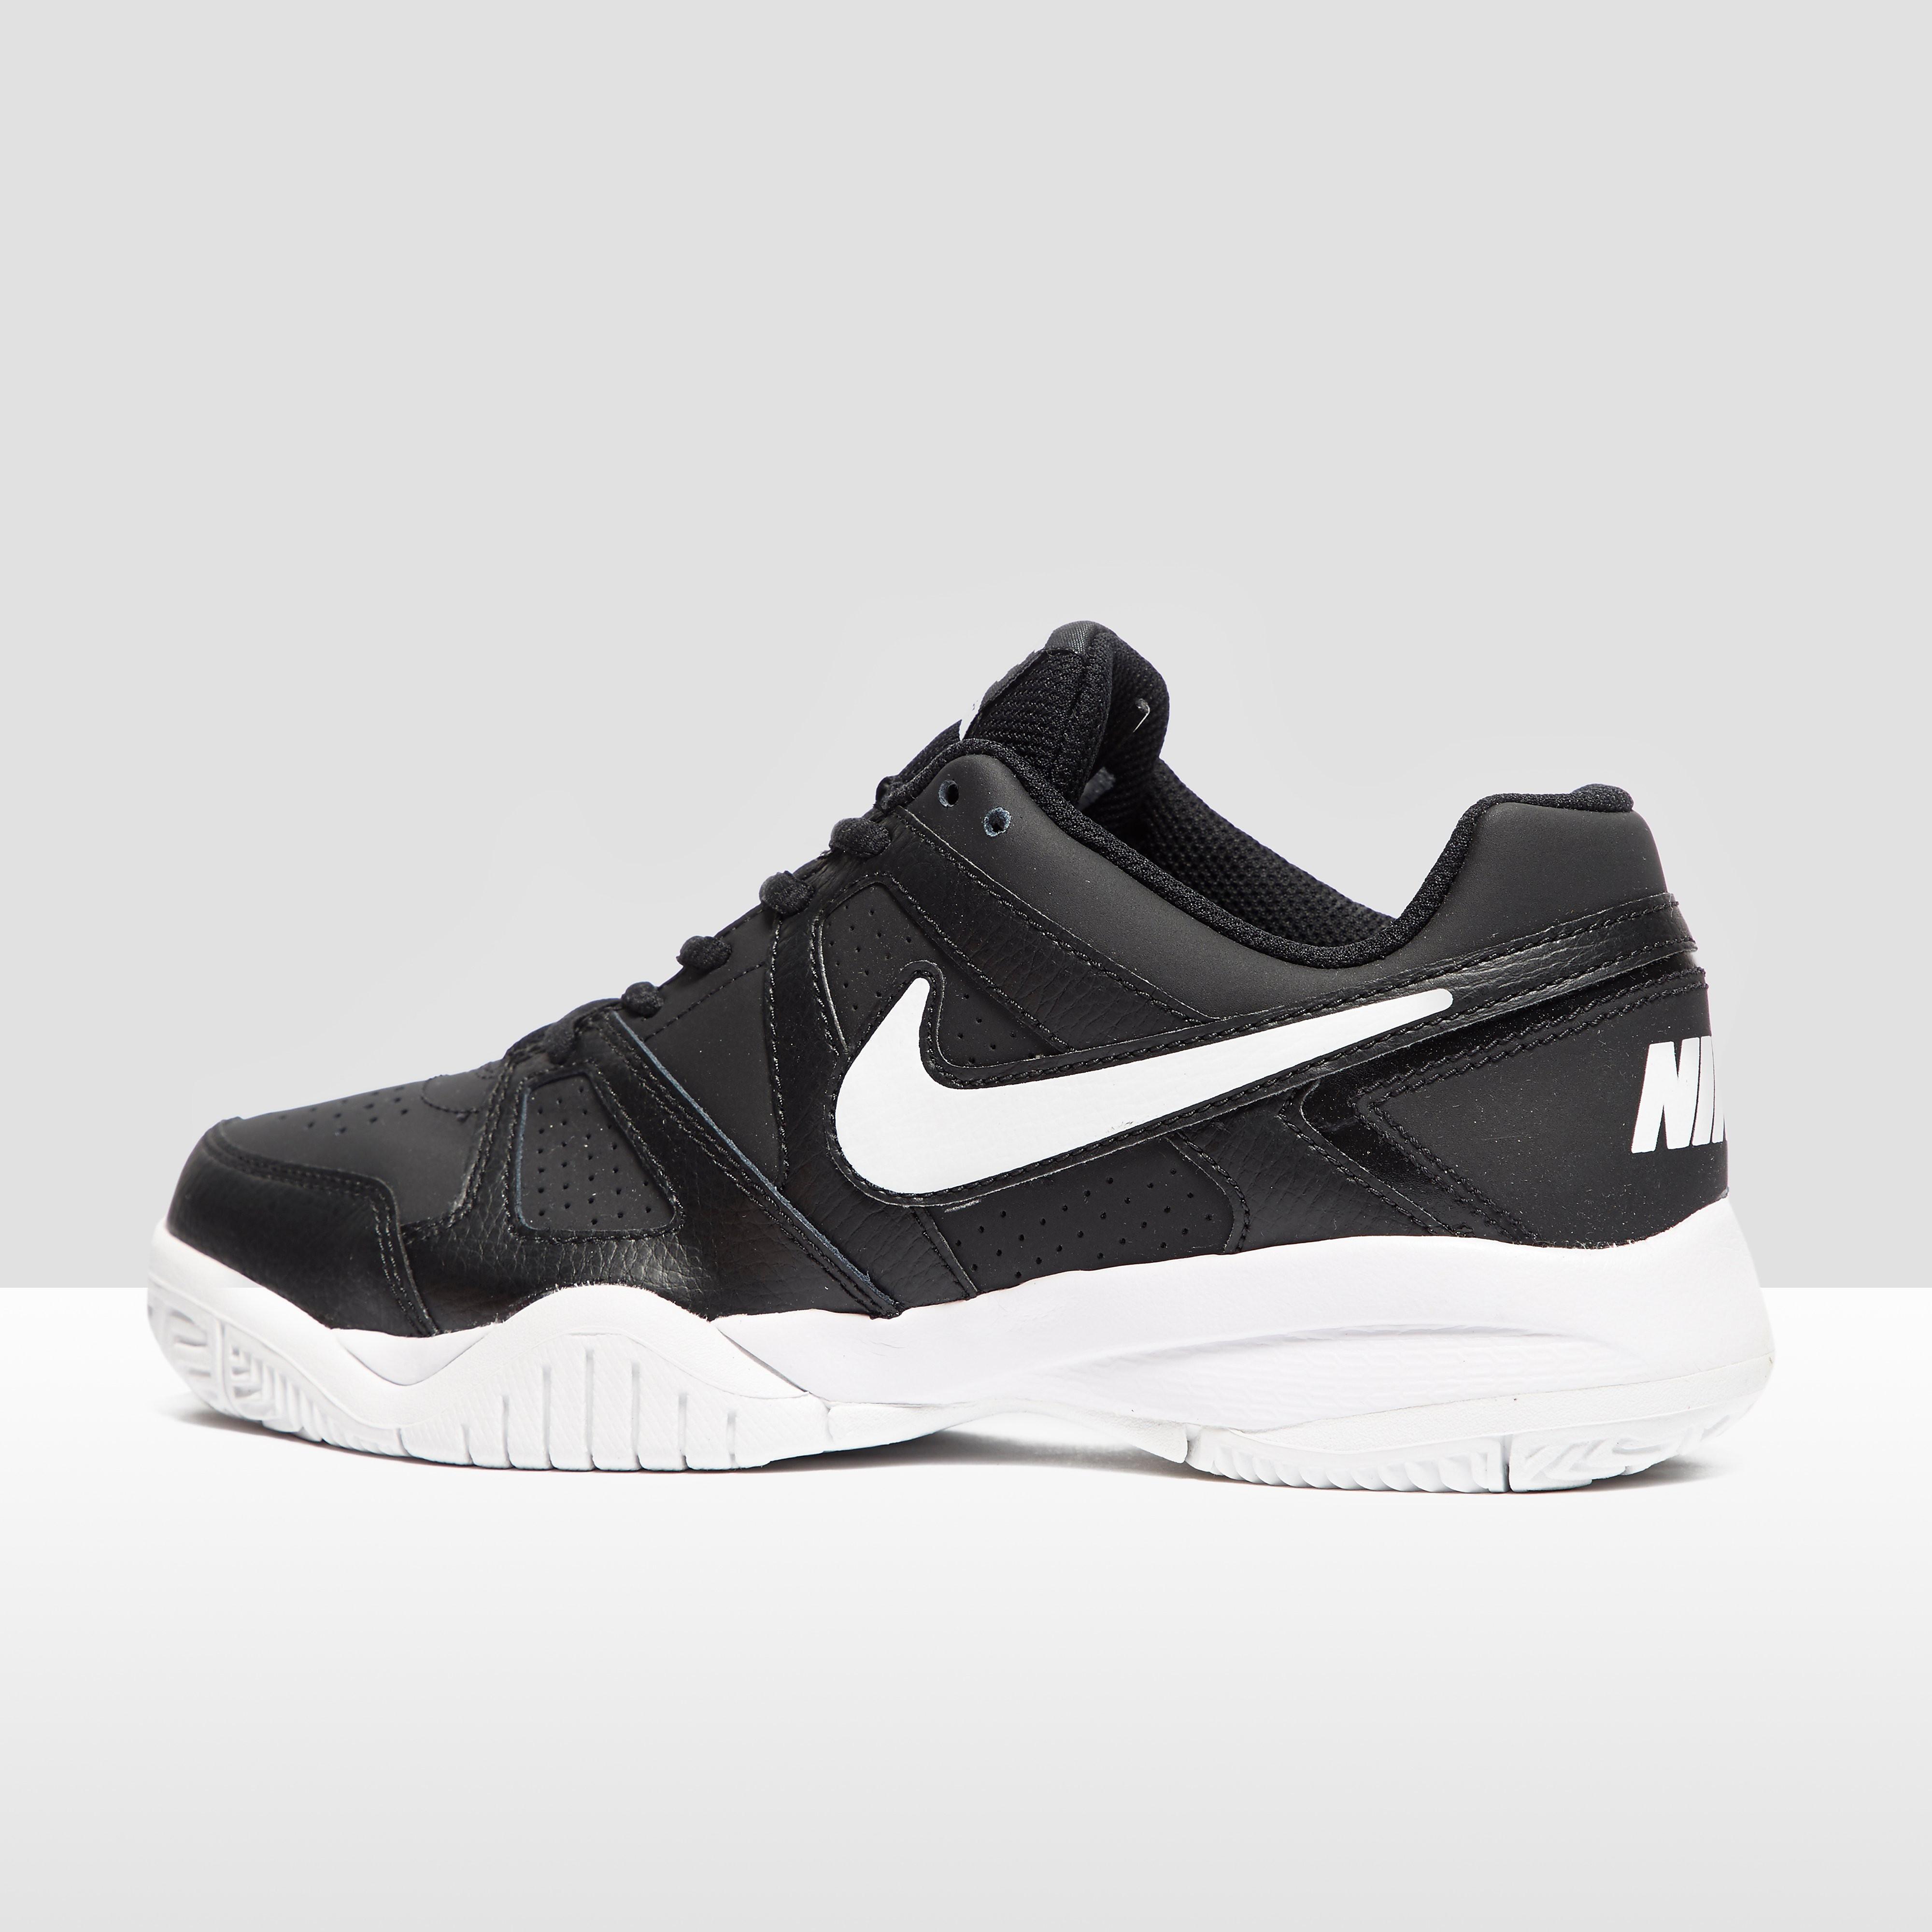 Nike NikeCourt City Court 7 Junior Tennis Shoes